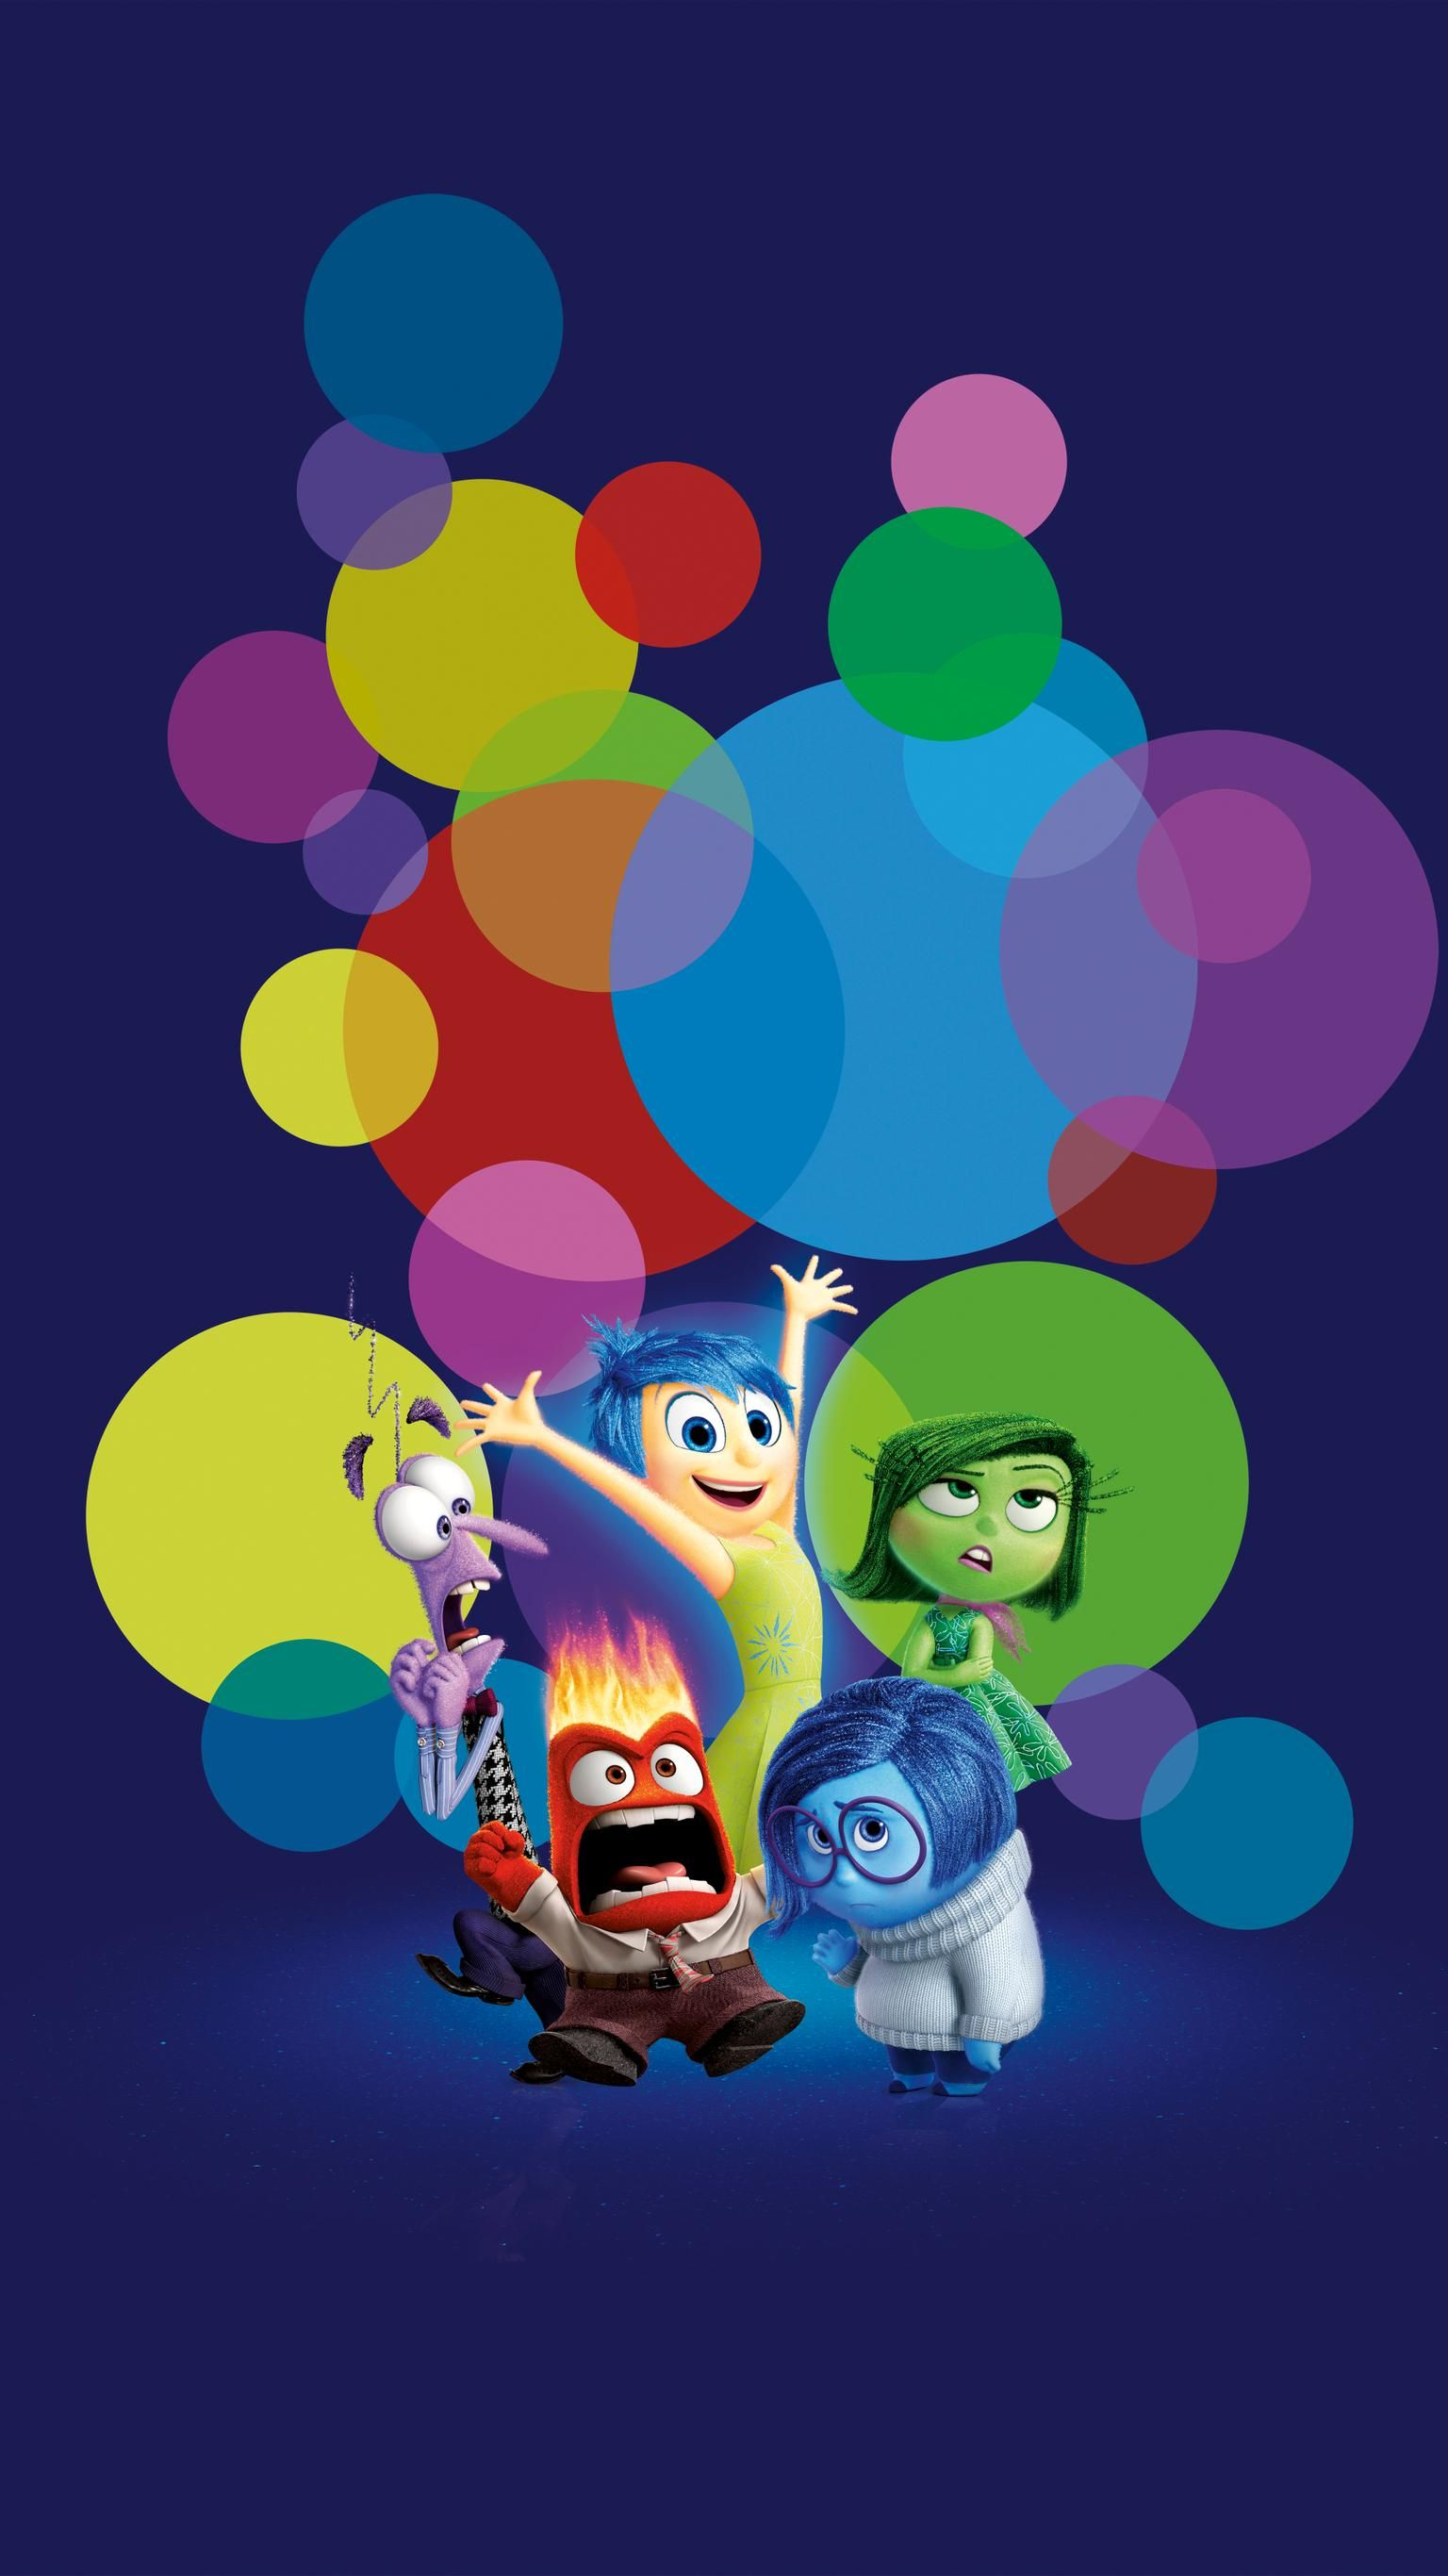 Inside Out 2015 Phone Wallpaper In 2020 Cute Disney Wallpaper